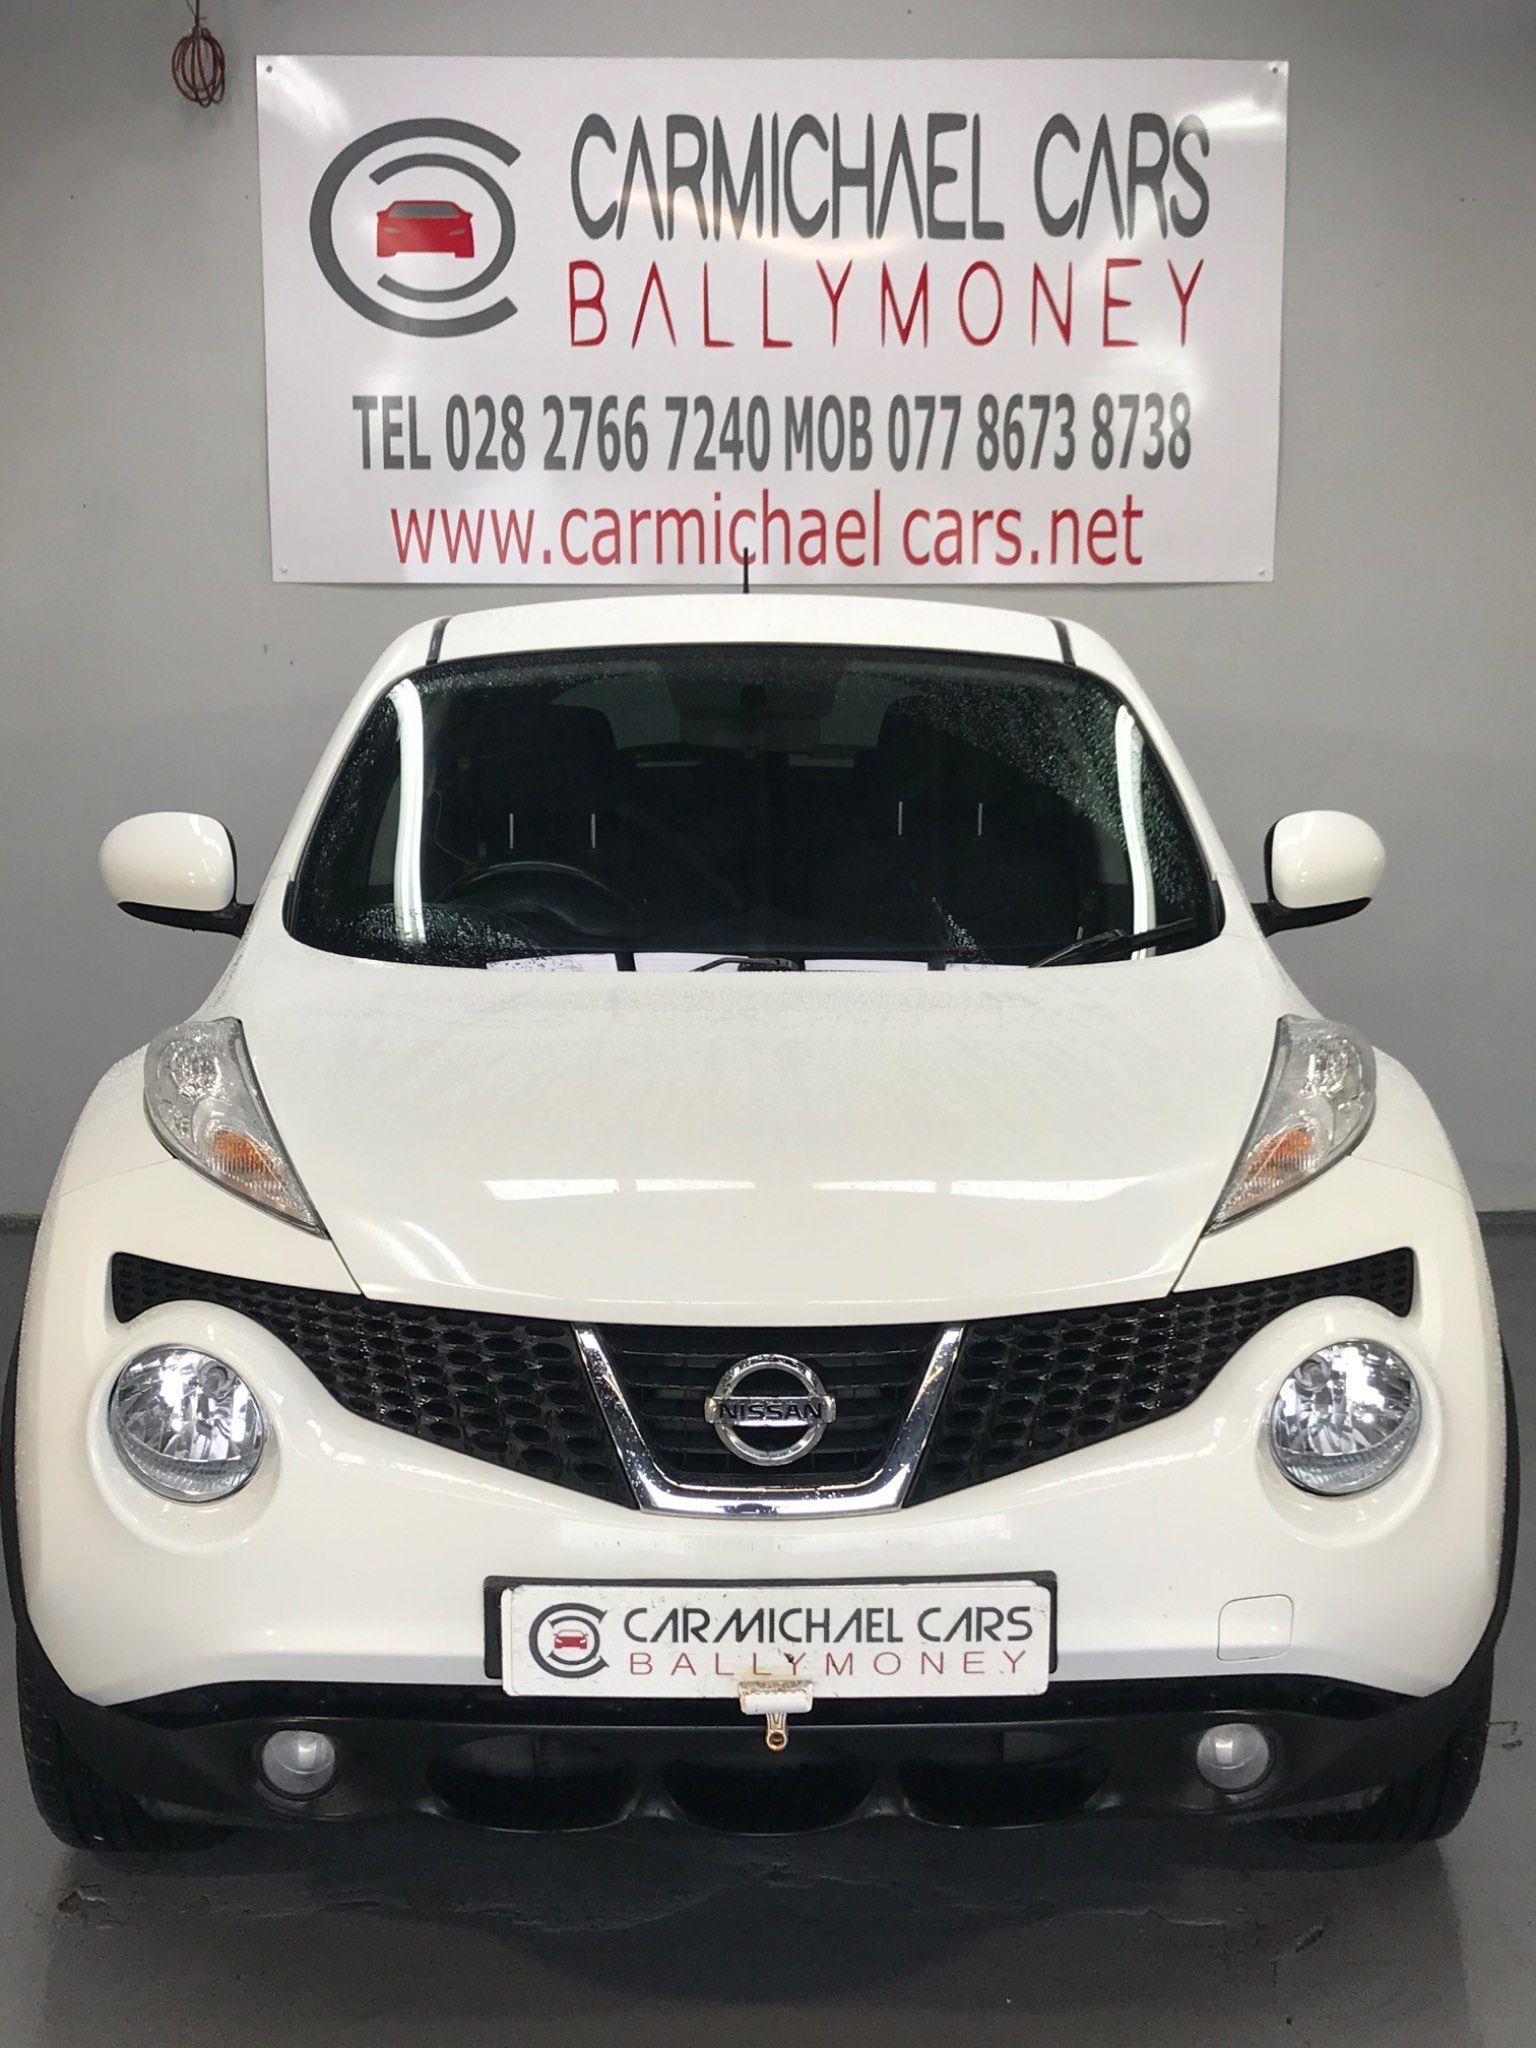 2011 NISSAN Juke 1.6 16v Acenta Petrol Manual WHITE, 90K, – Carmichael Cars Ballymoney full